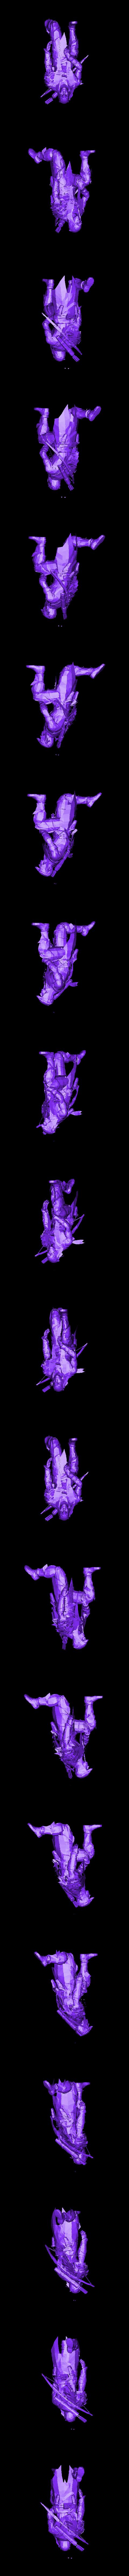 HUNTER.stl Download free STL file Hunter • 3D print template, Boris3dStudio